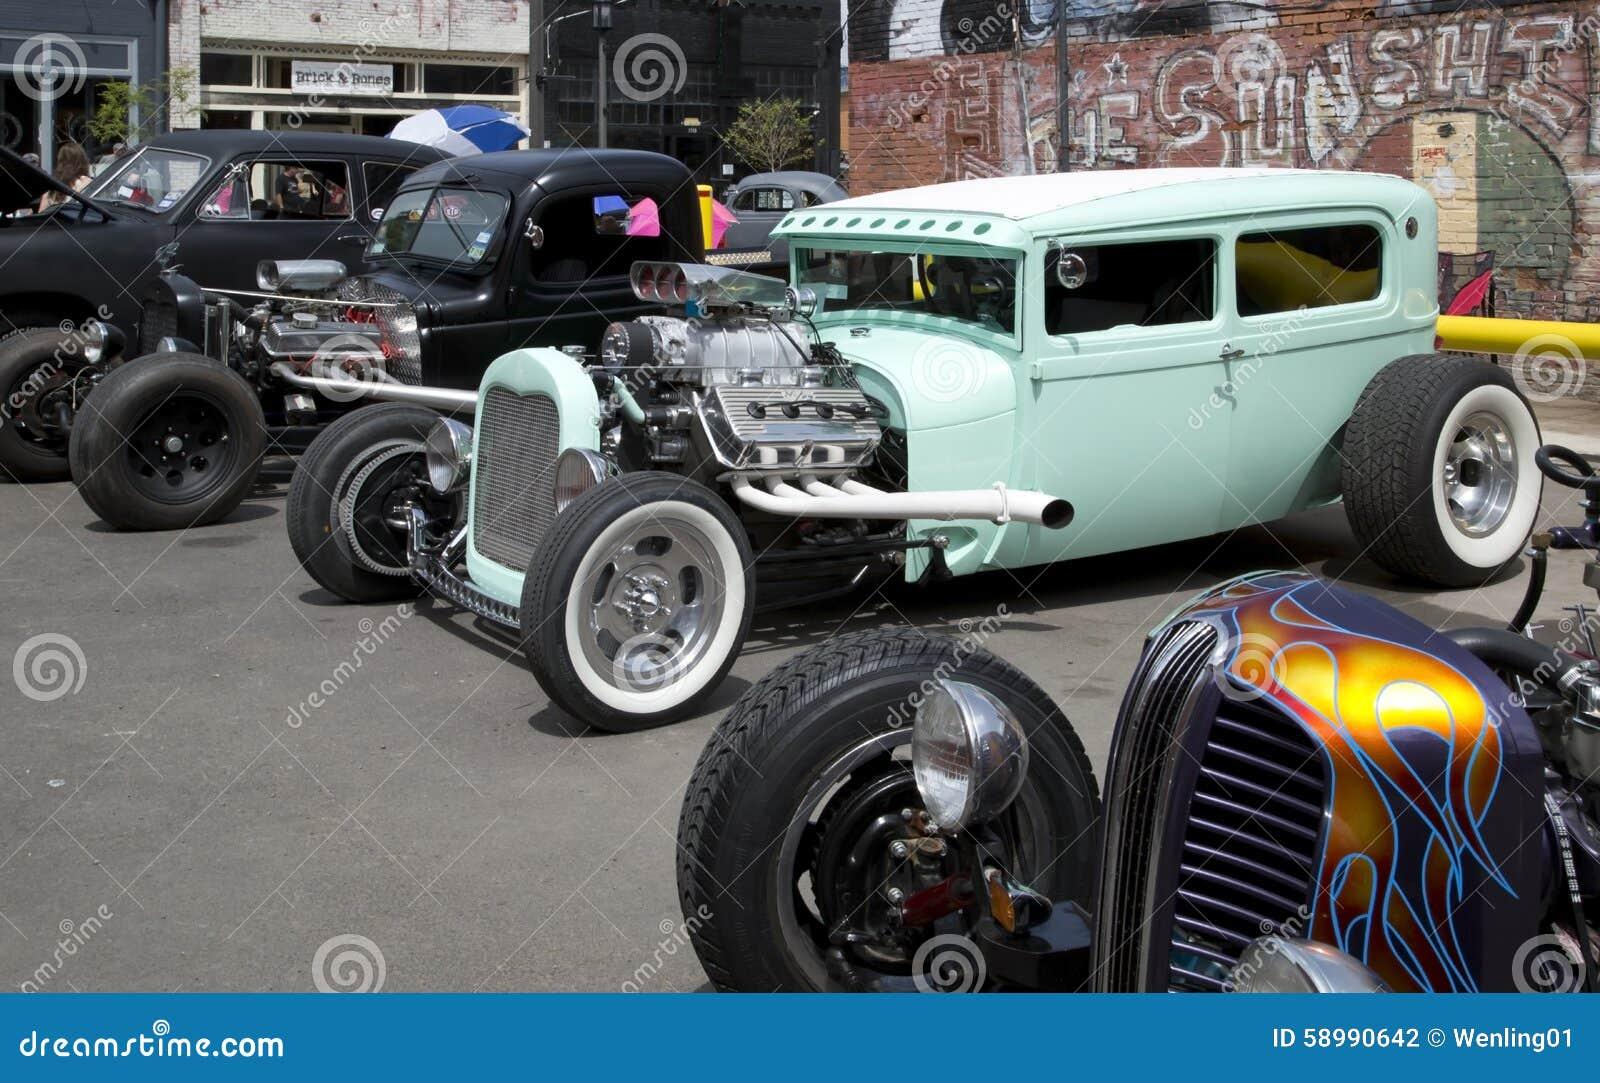 Nice Vintage Car Show In City Dallas Editorial Photography Image - Car show dallas